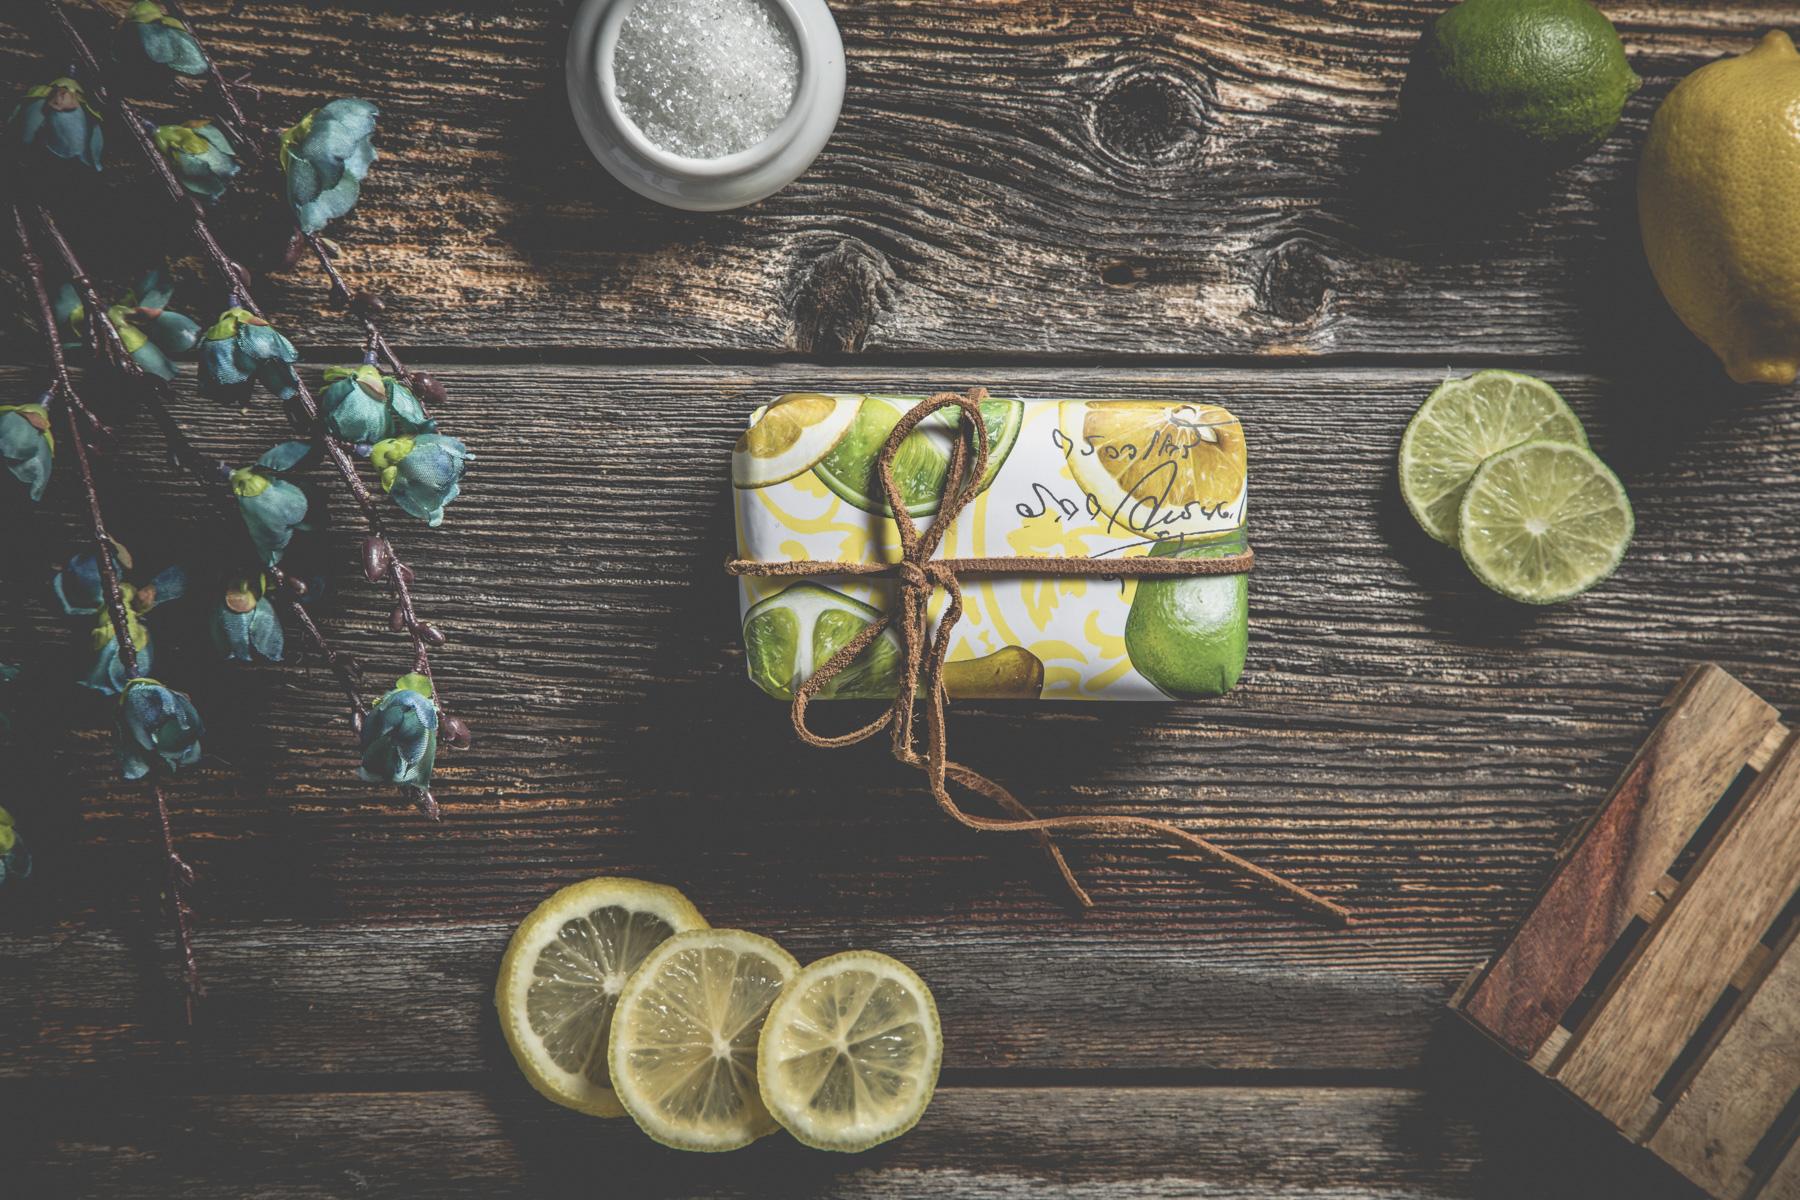 Sabrina Belzil Photographe-PixelFabrique savon-lime-citron-jaune-vert-fleur-bleu